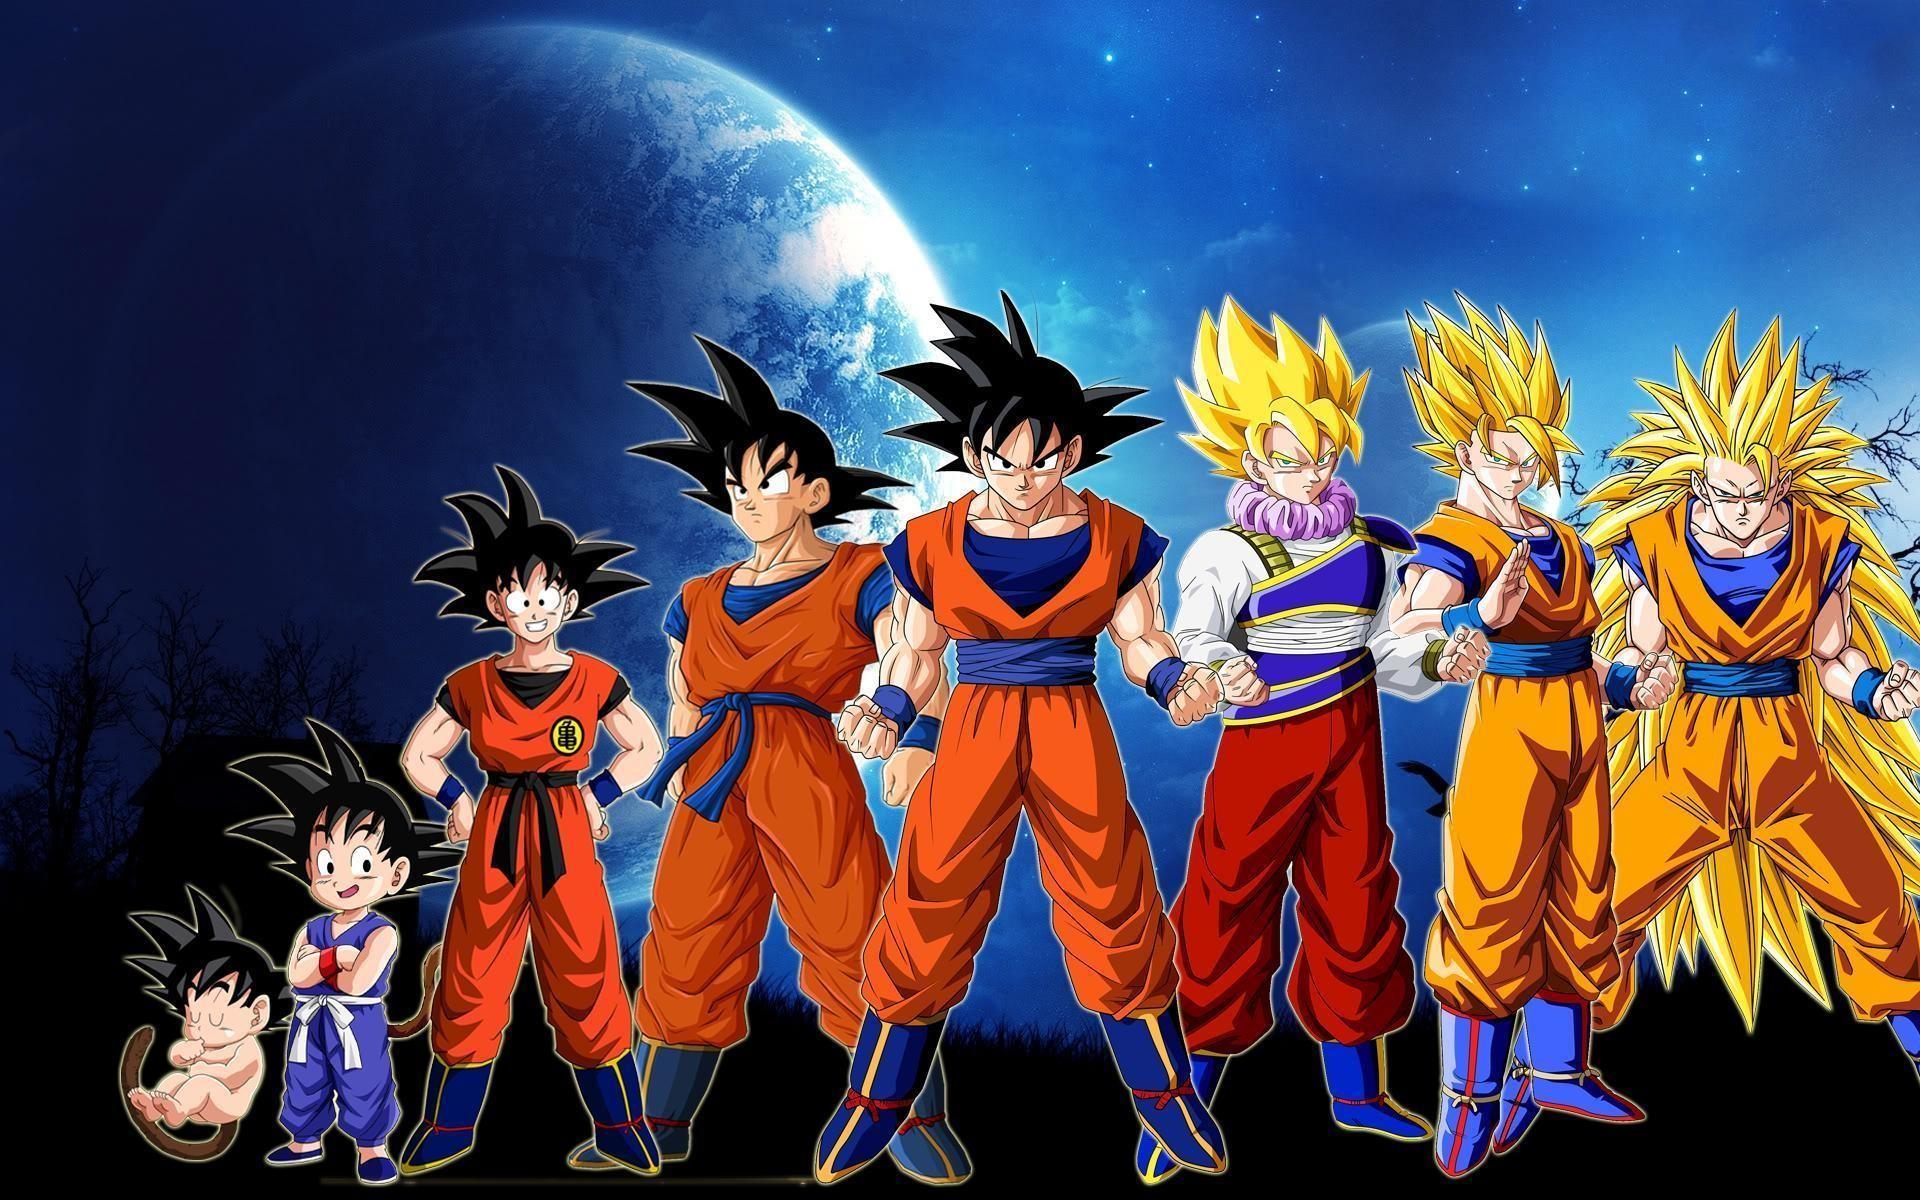 Res: 1920x1200, Dragon Ball Z Goku Story Wallpaper Download HD | wolcartoon.